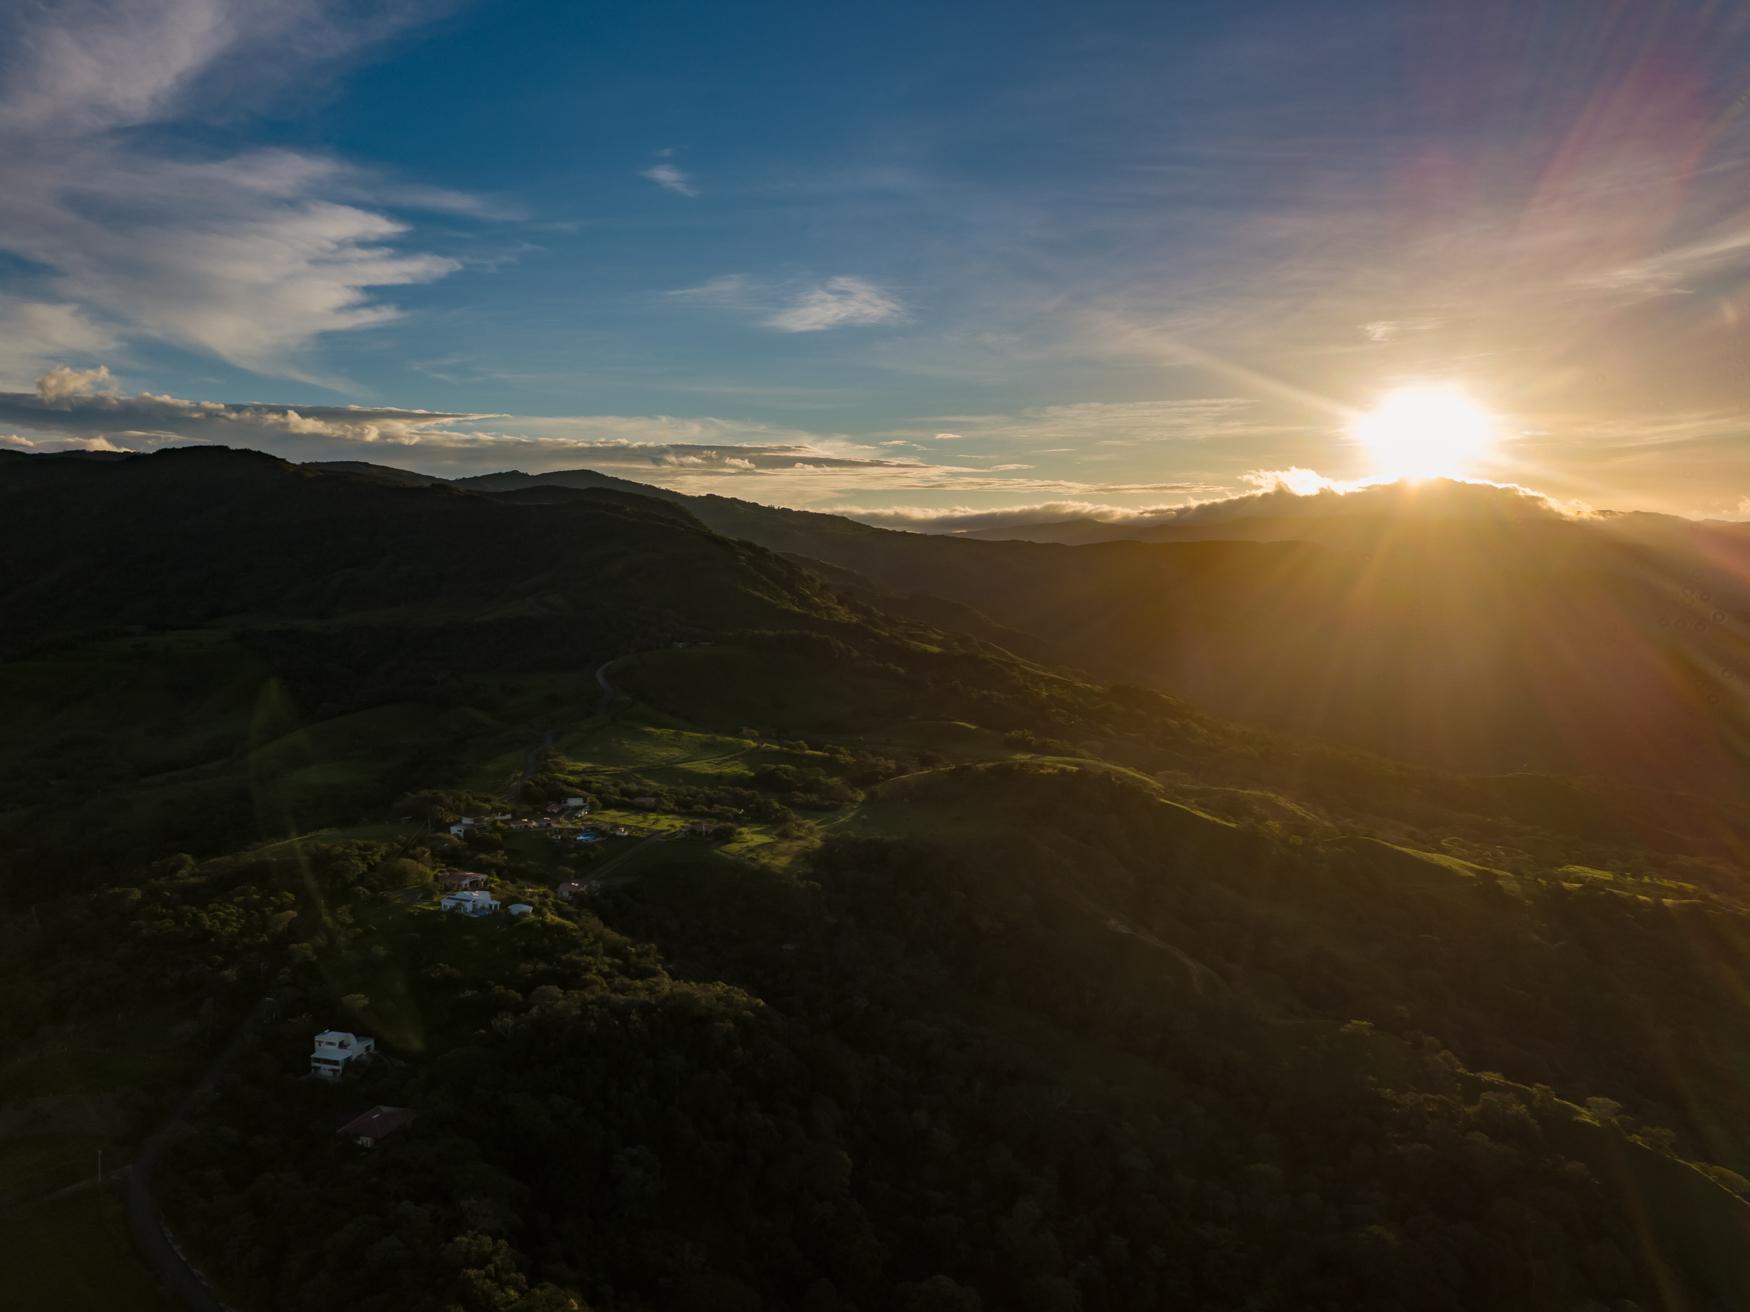 Yoga-Retreat-Drone-Photography-Costa-Rica-29.jpg